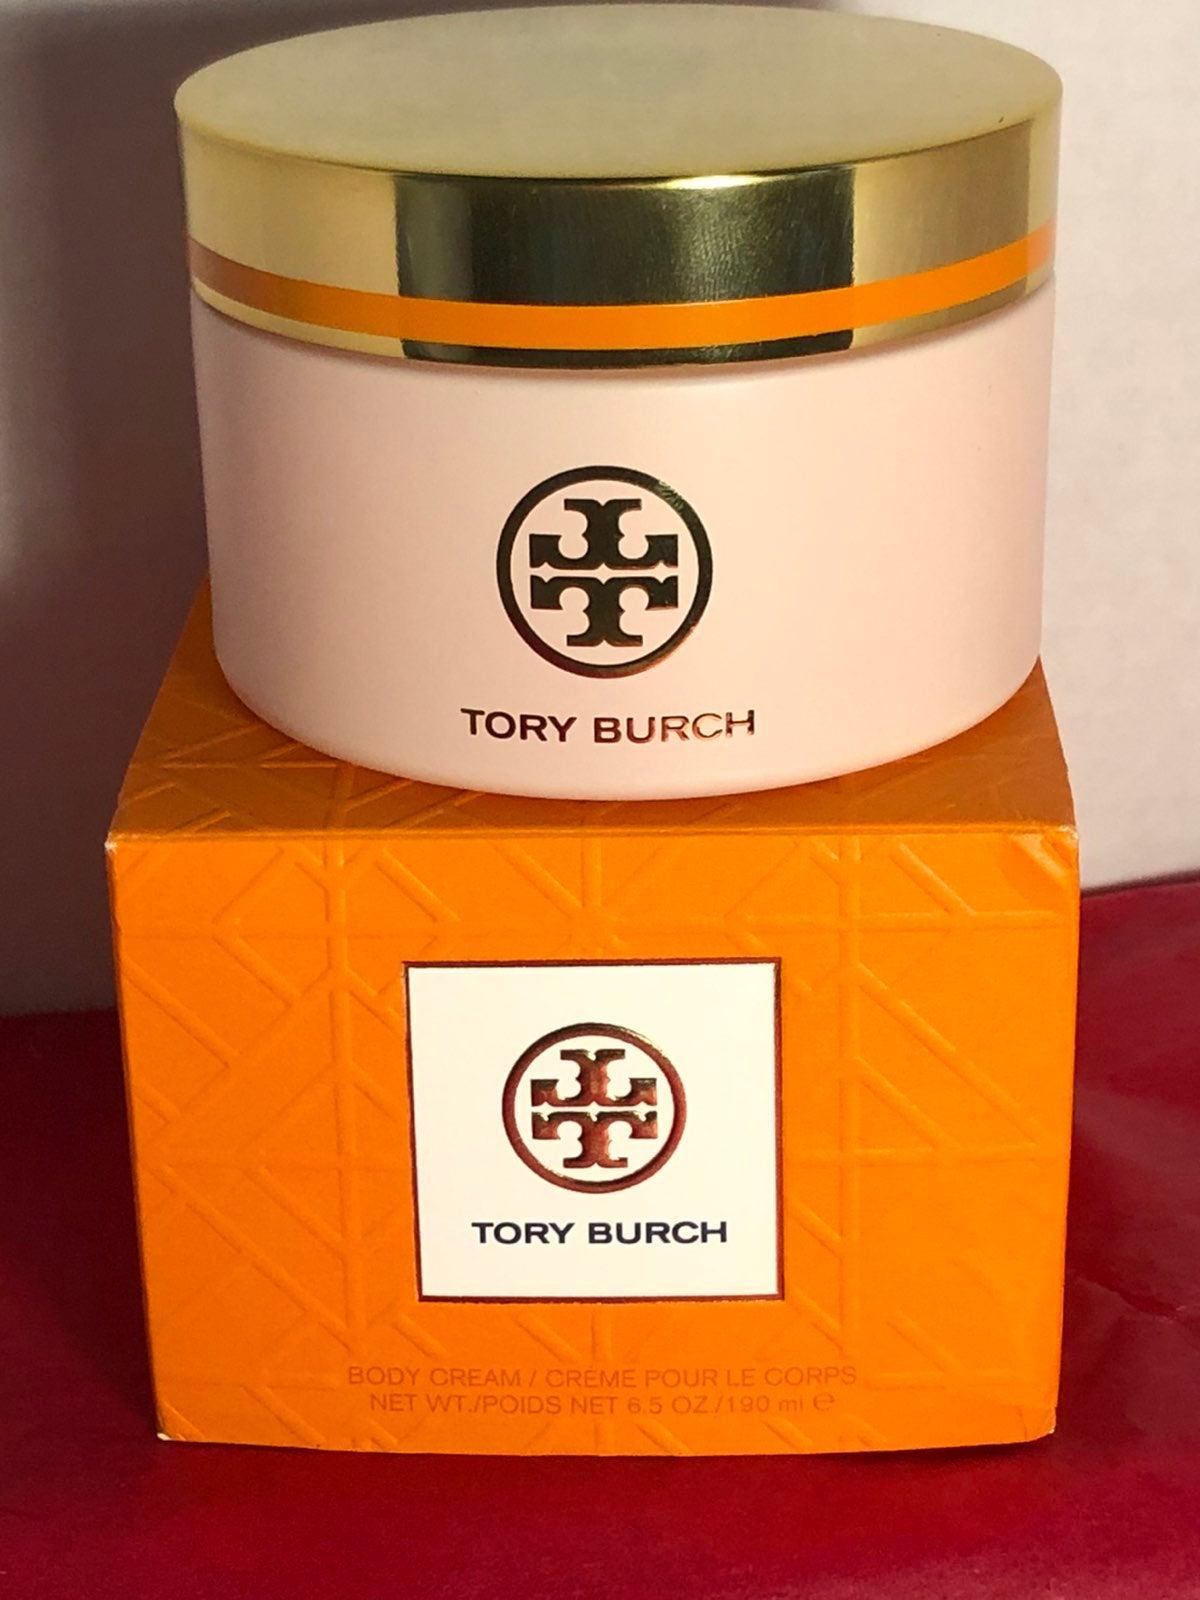 Tory Burch Body cream 190ml 6.5oz